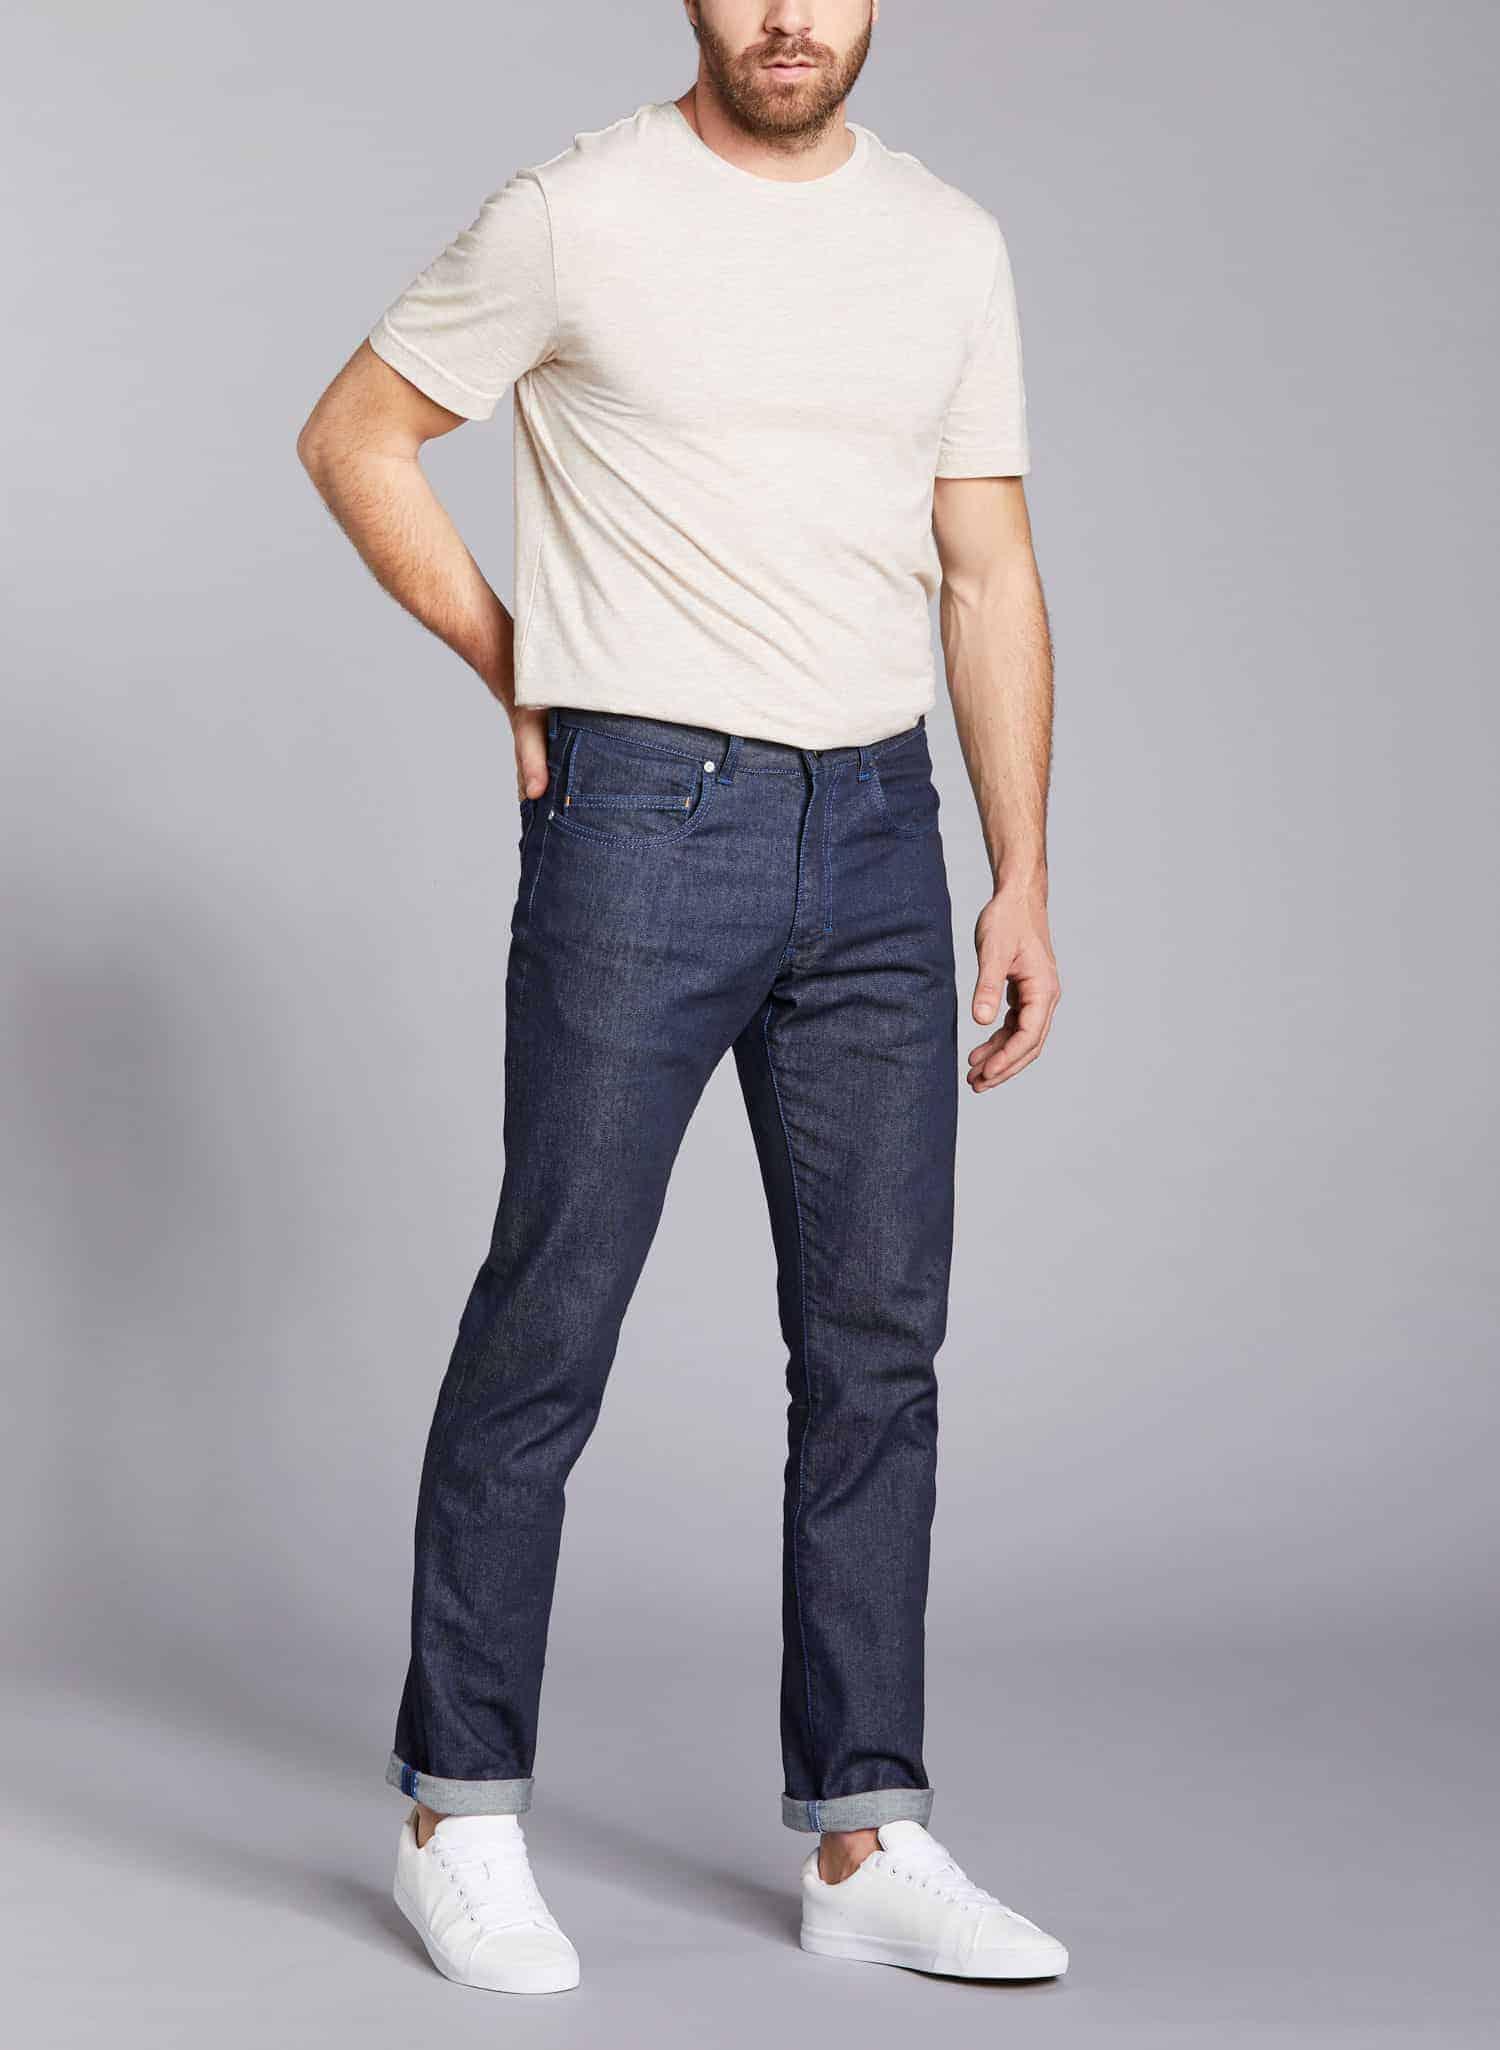 y-alpine-jean-homme-brut-denim-poche-smartphone - Atelier TUFFERY